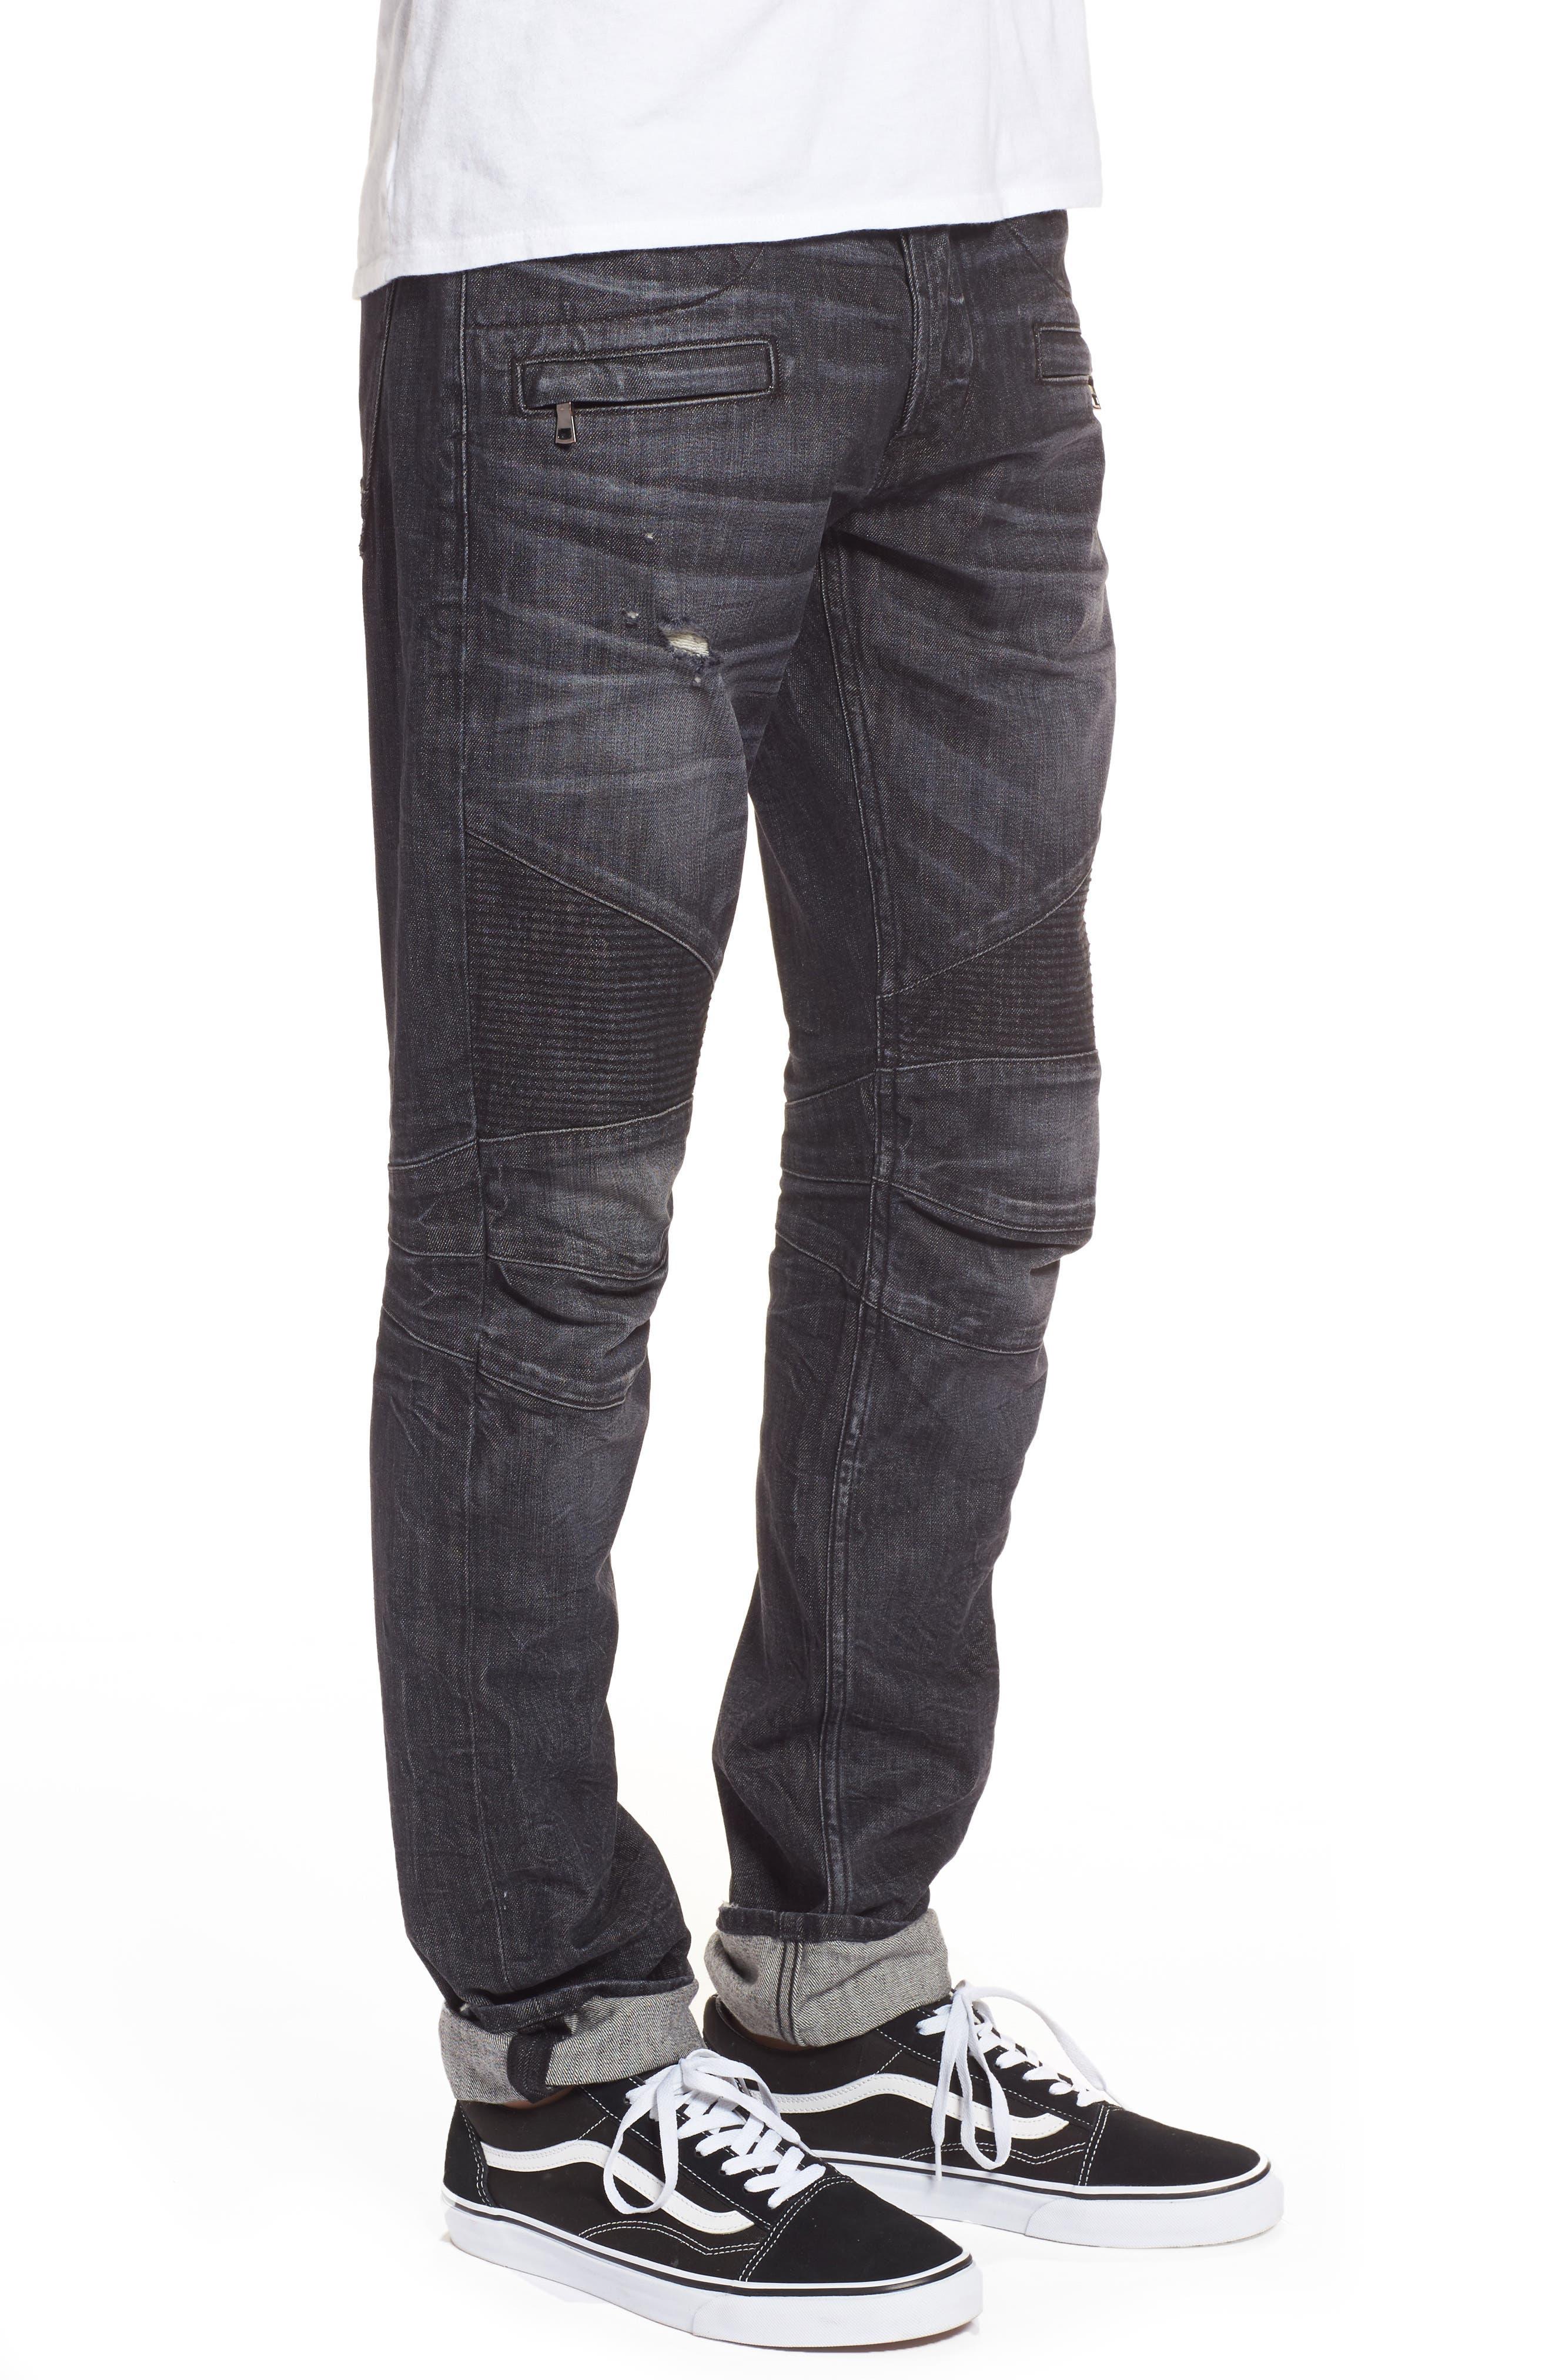 Blinder Biker Moto Skinny Fit Jeans,                             Alternate thumbnail 3, color,                             021